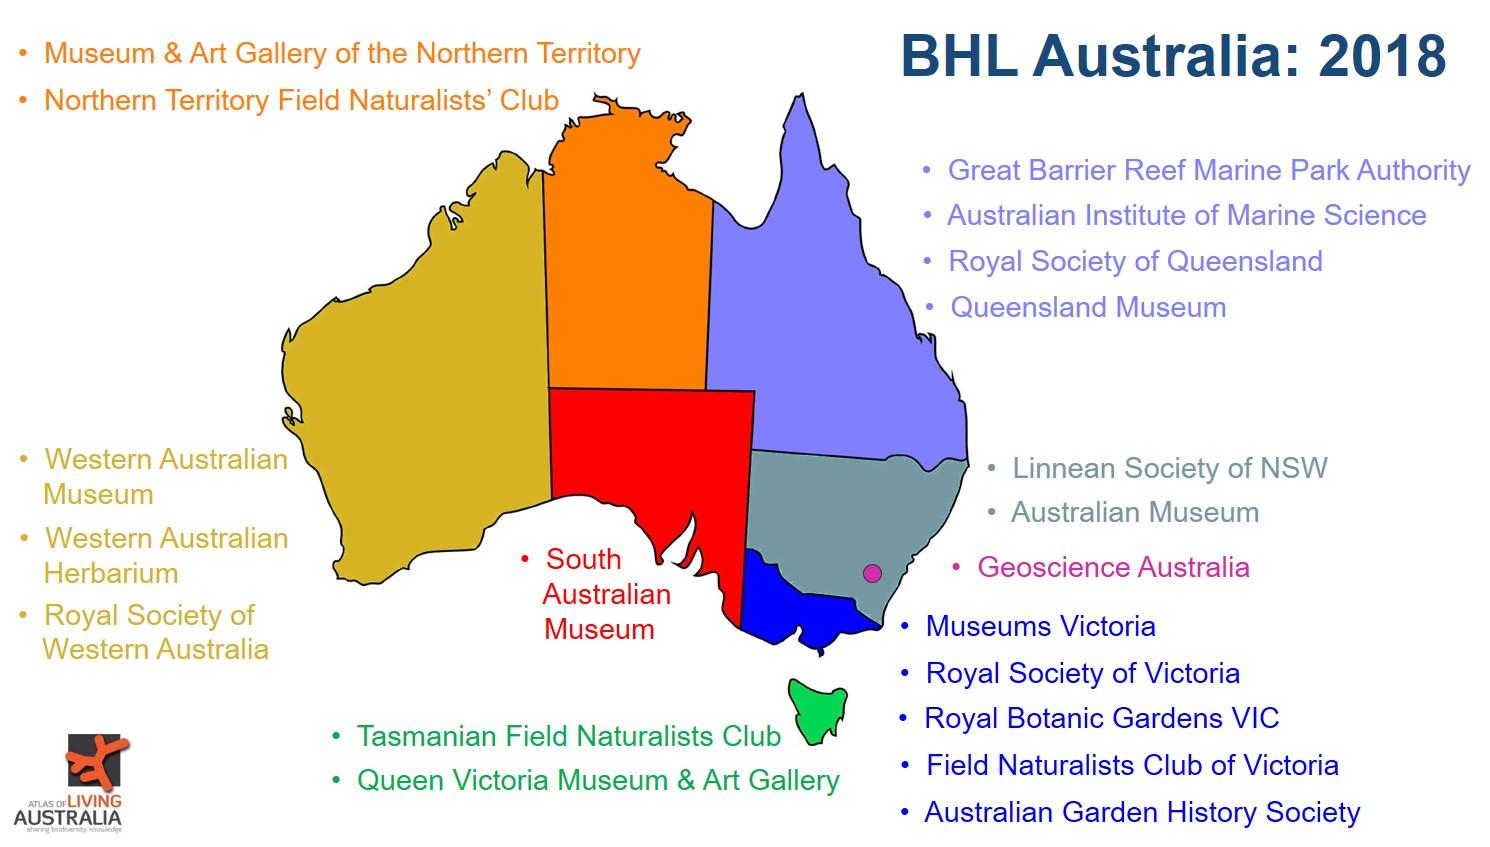 BHL Australia Contributors